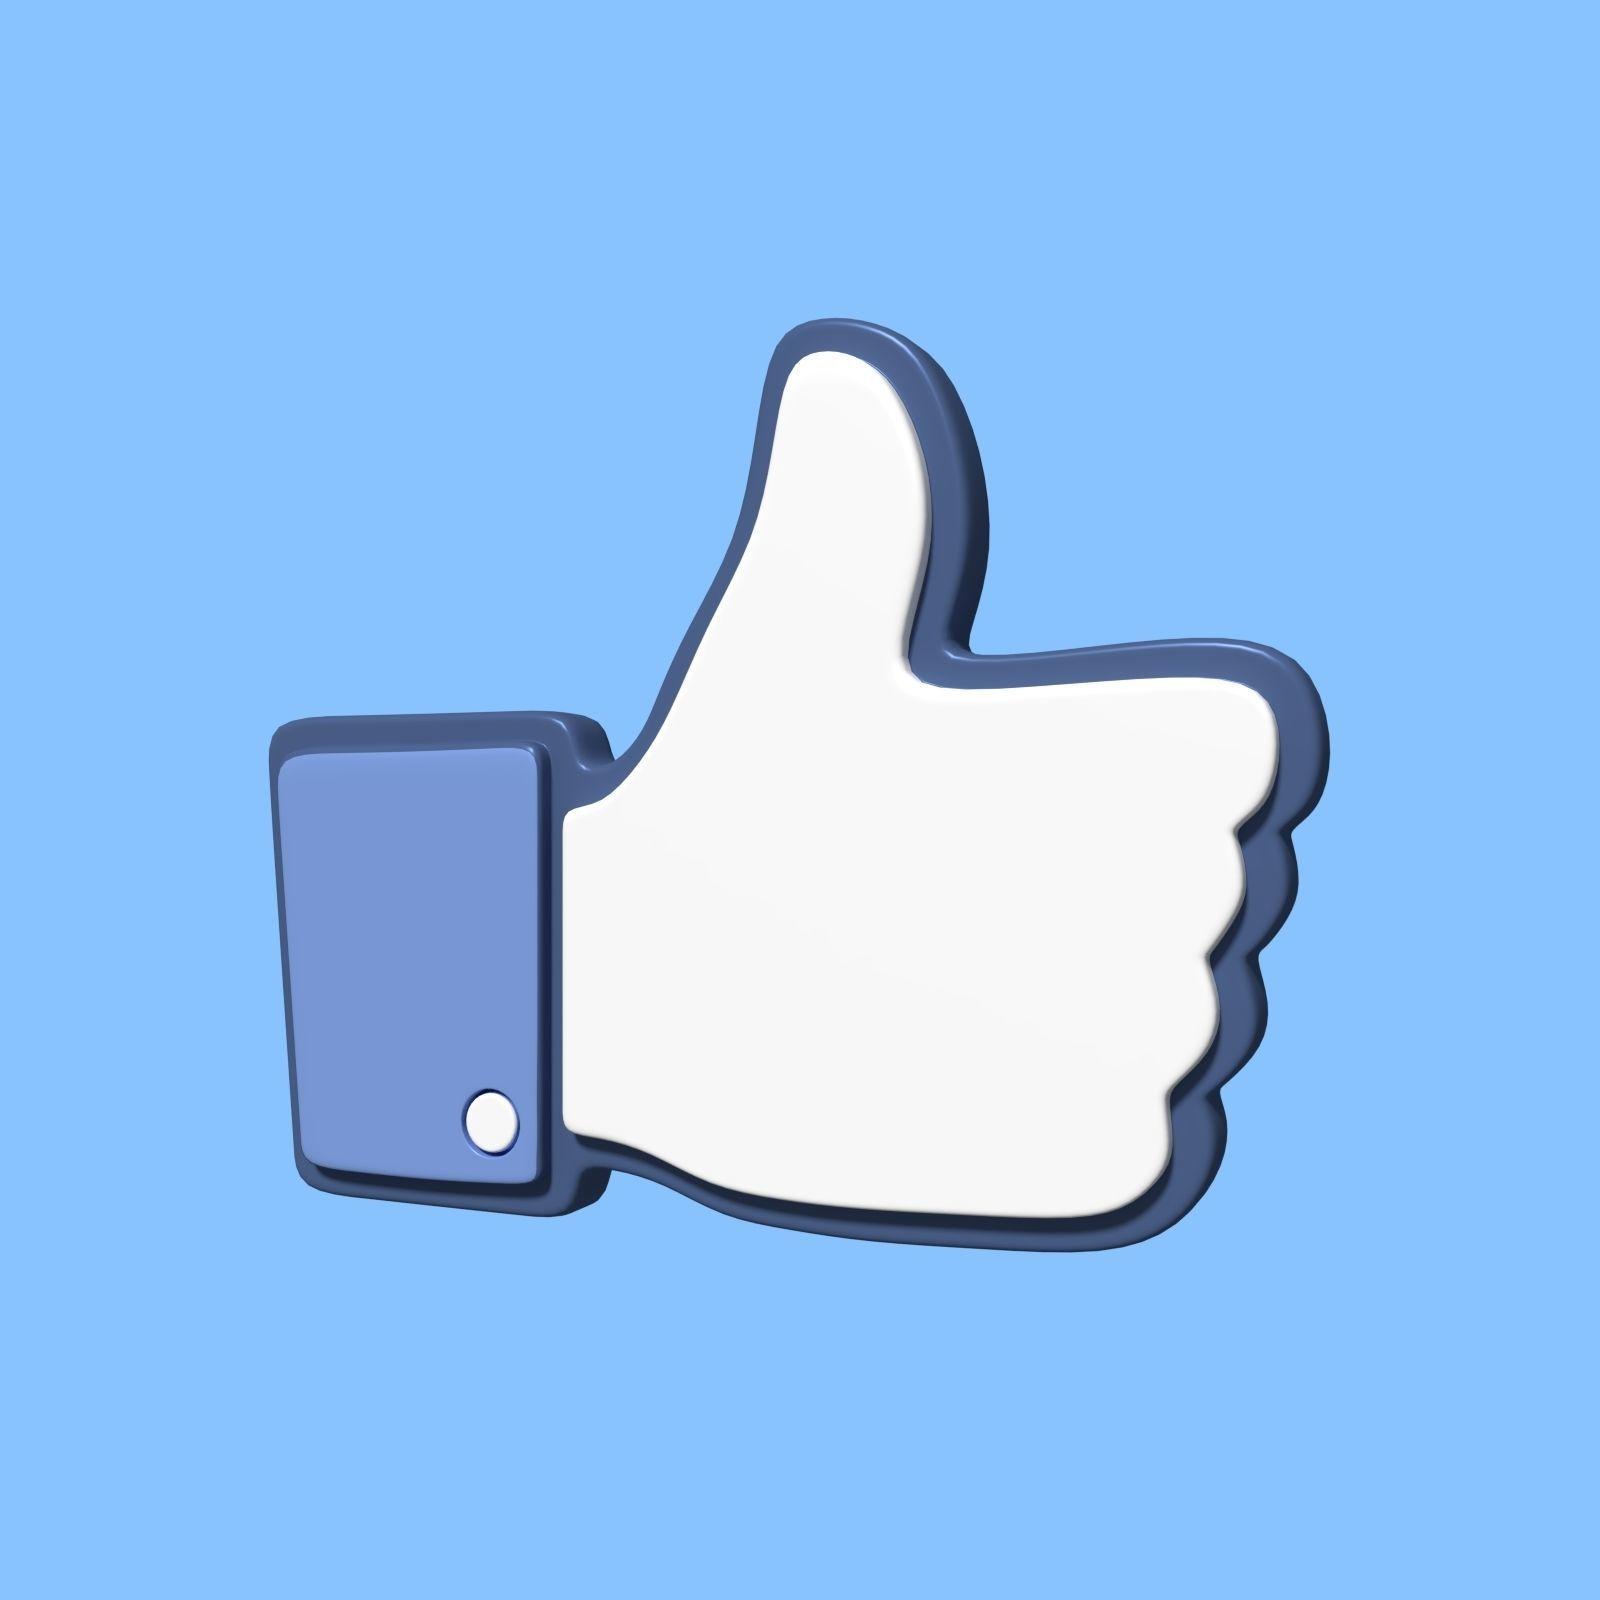 Facebook like button - Wikipedia